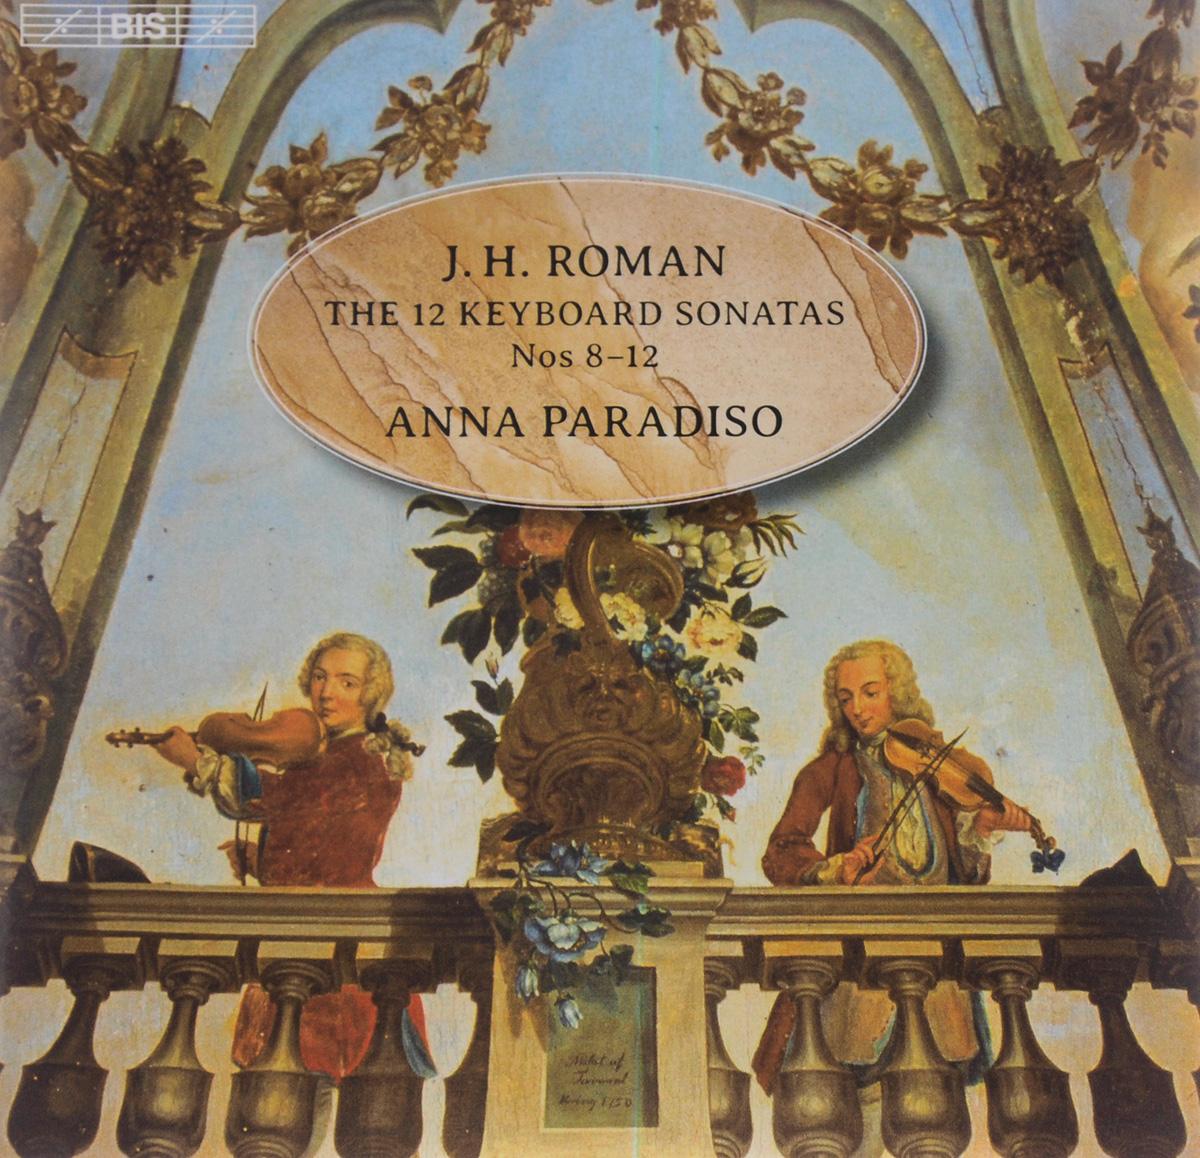 Anna Paradiso. J. H. Roman. 12 Keyboard Sonatas Nos. 8-12 / Johan Agrell. Sonata II In C Major (SACD)